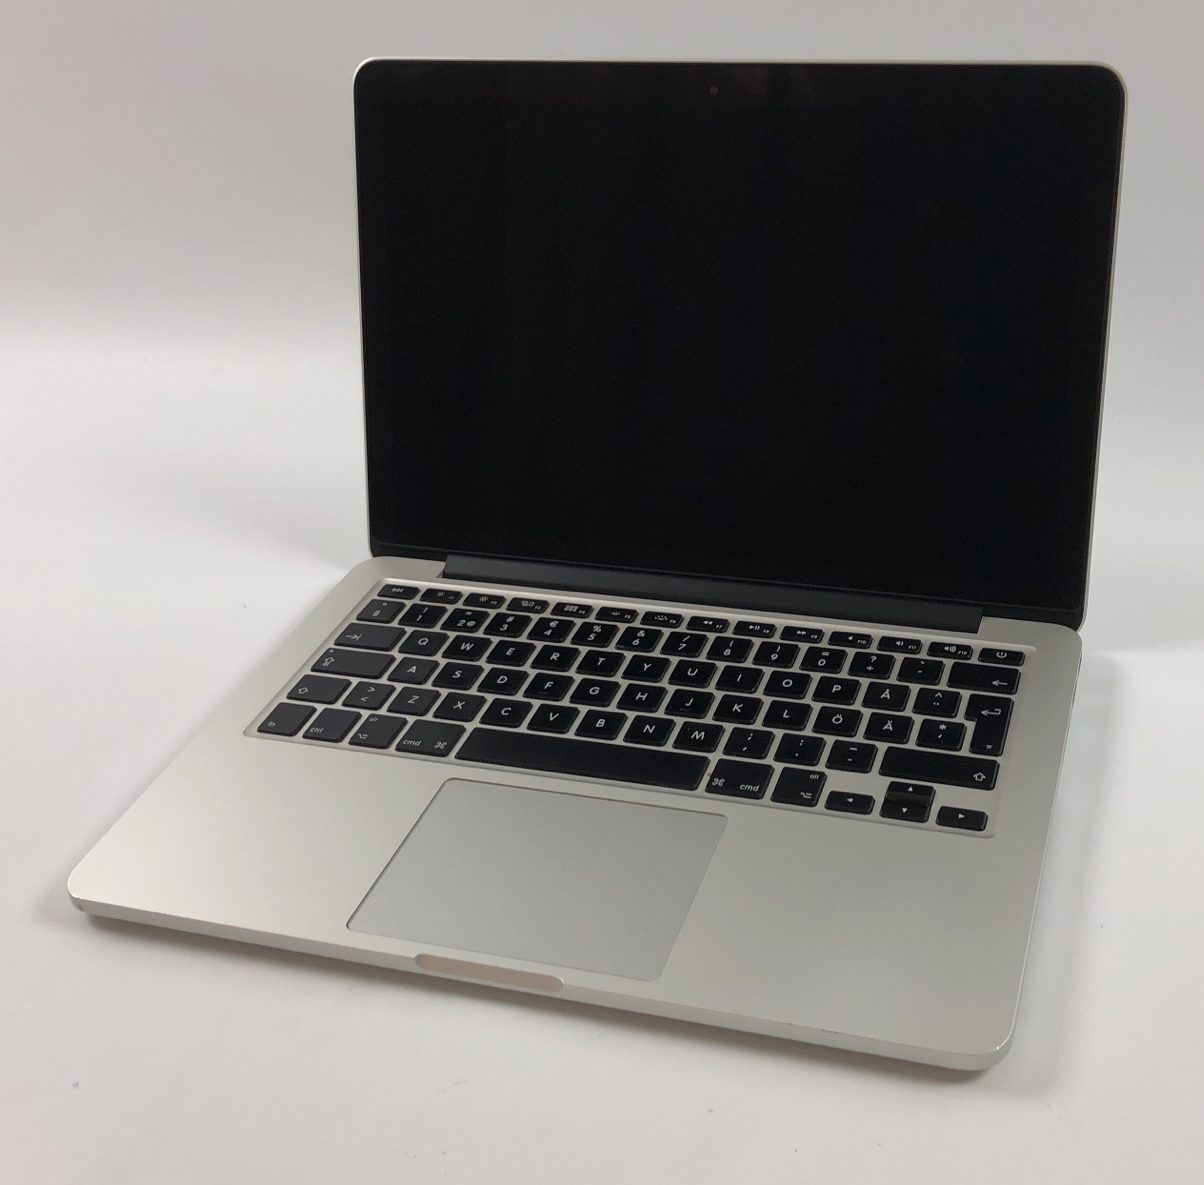 "MacBook Pro Retina 13"" Mid 2014 (Intel Core i5 2.8 GHz 16 GB RAM 512 GB SSD), Intel Core i5 2.8 GHz, 16 GB RAM, 512 GB SSD, imagen 1"